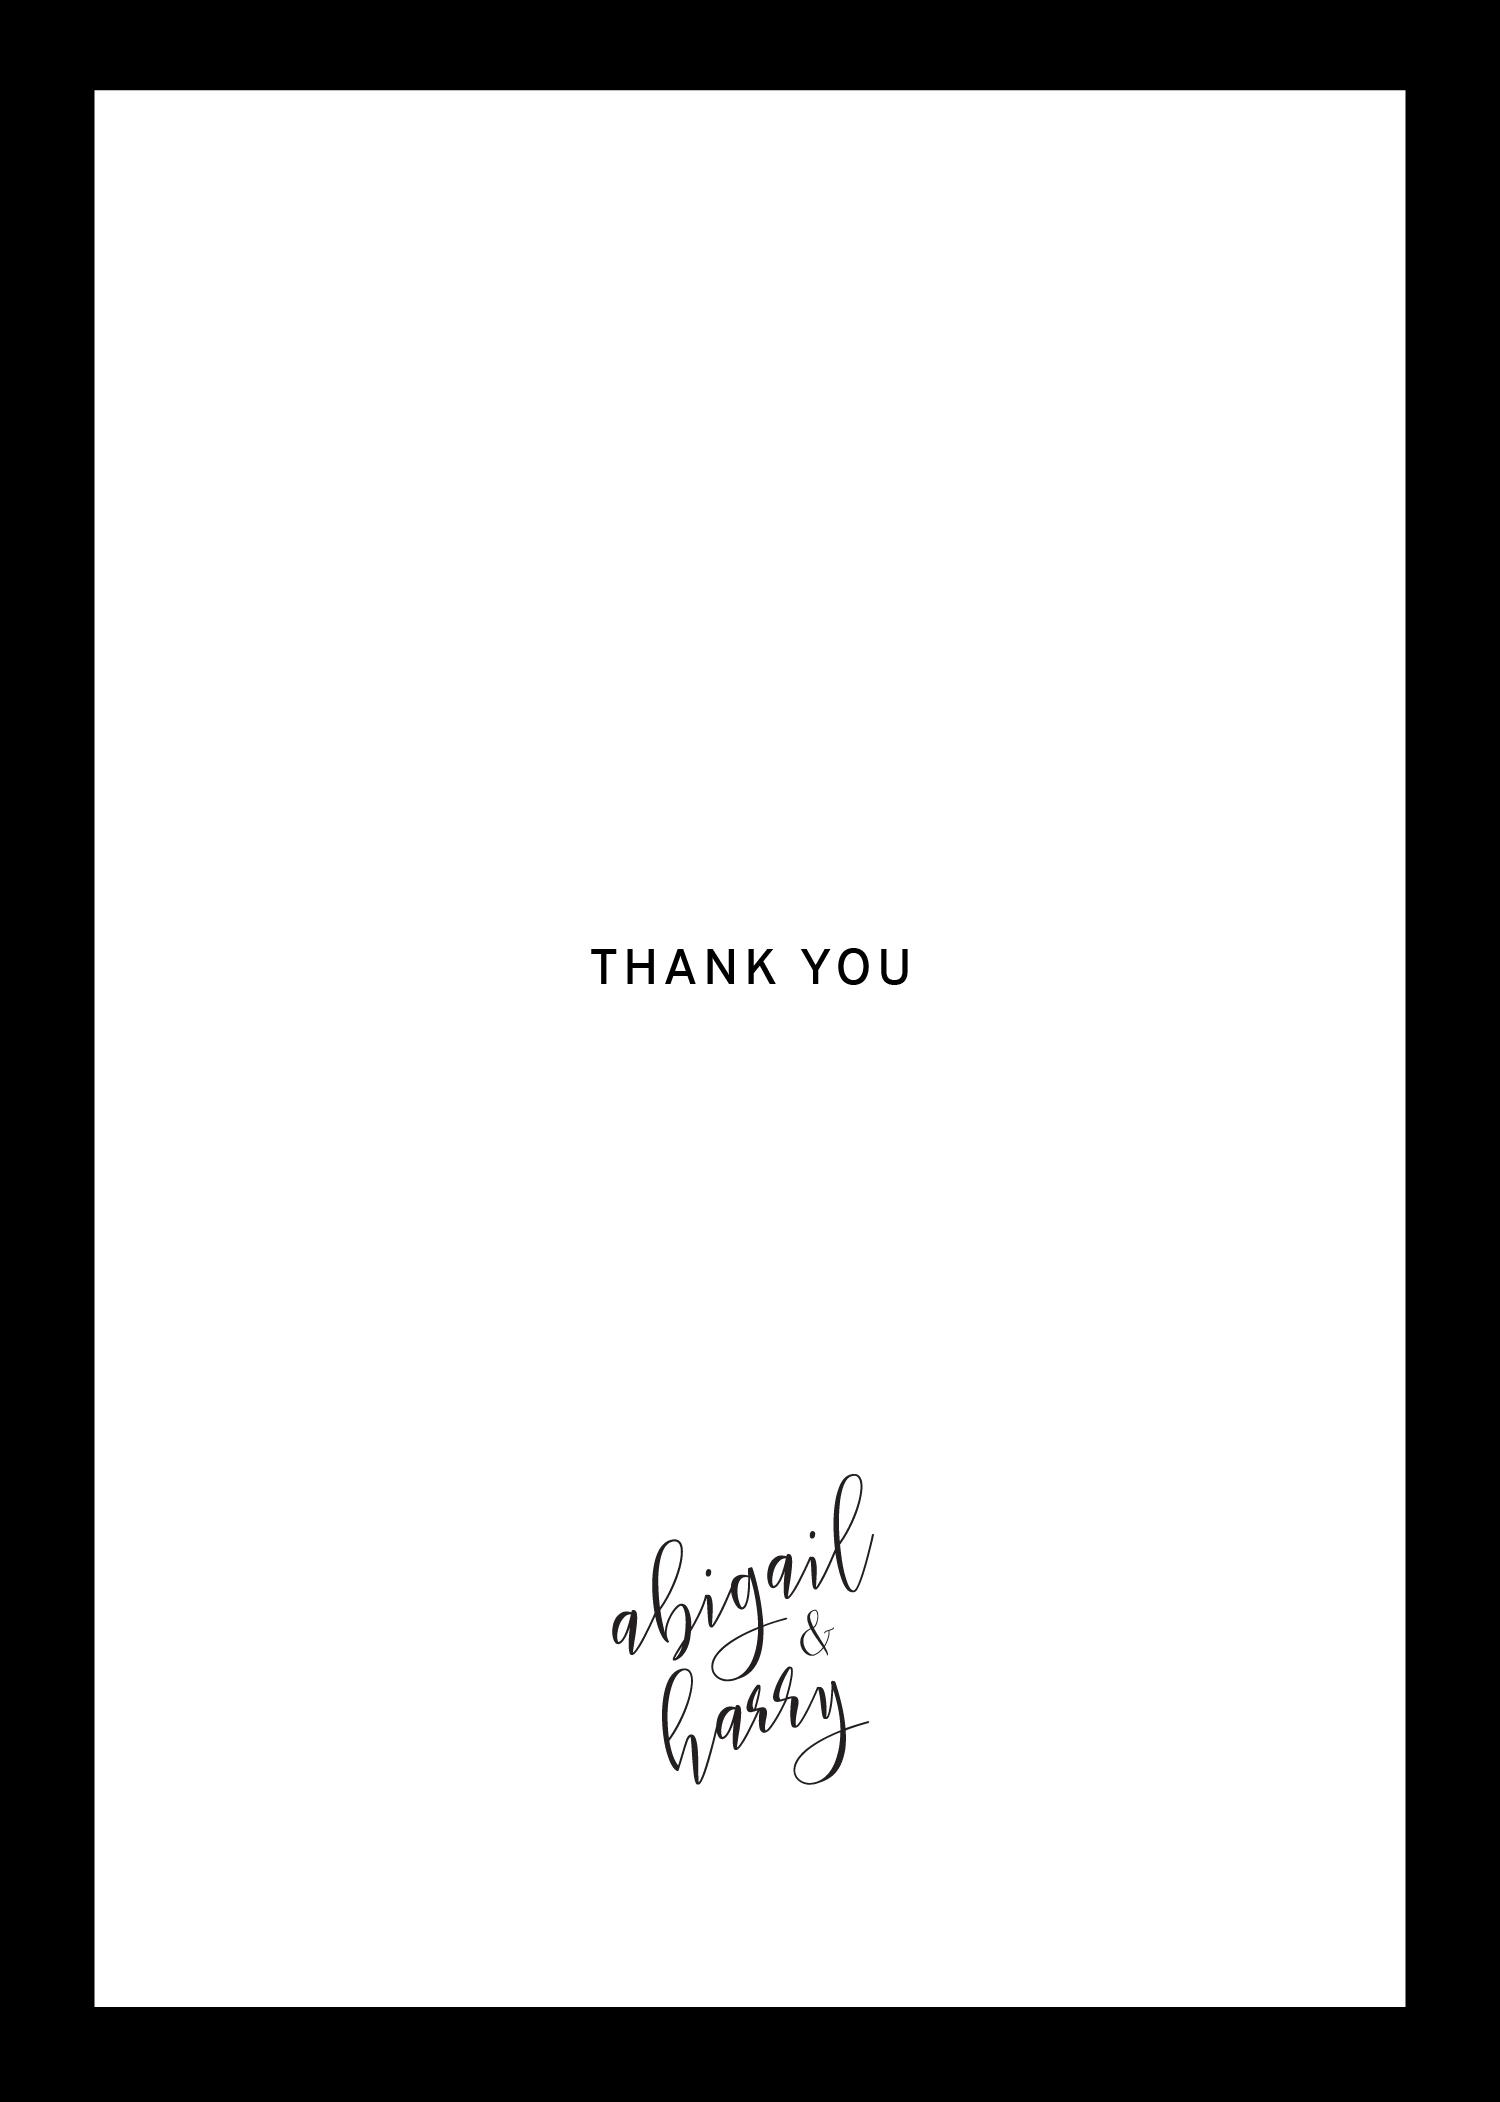 Sleek border - Thank You Cards